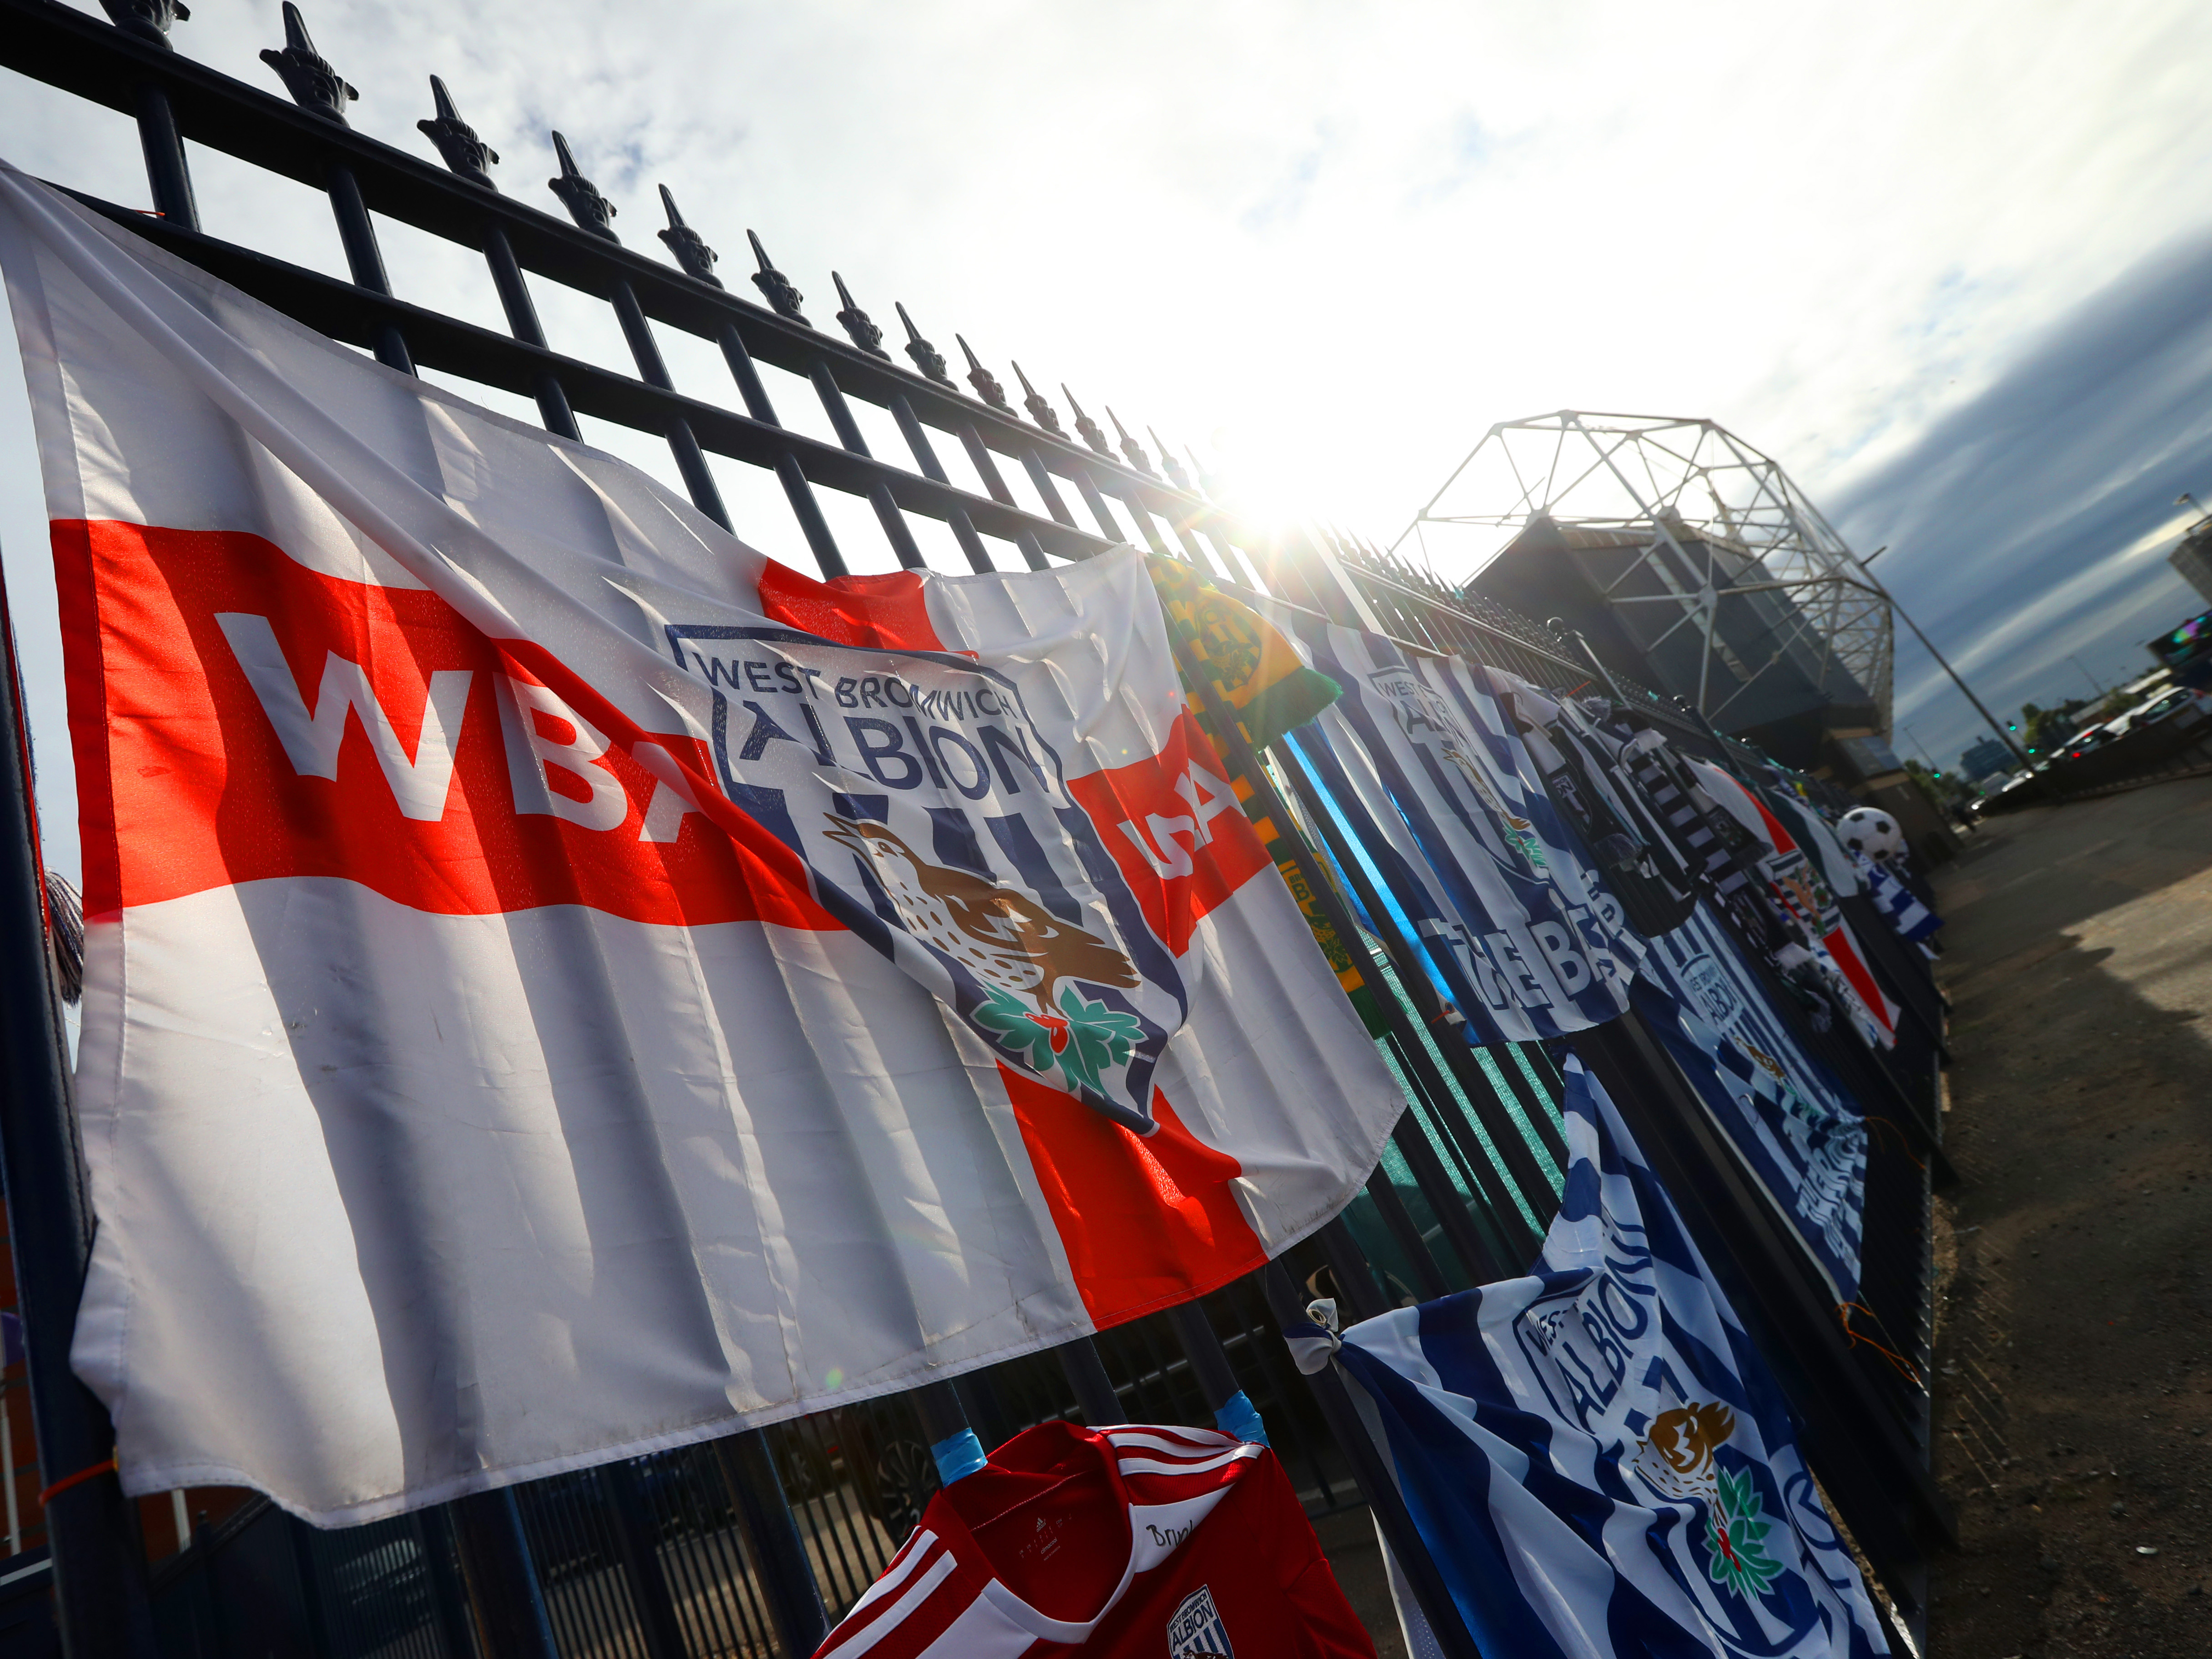 Flags at Hawthorns